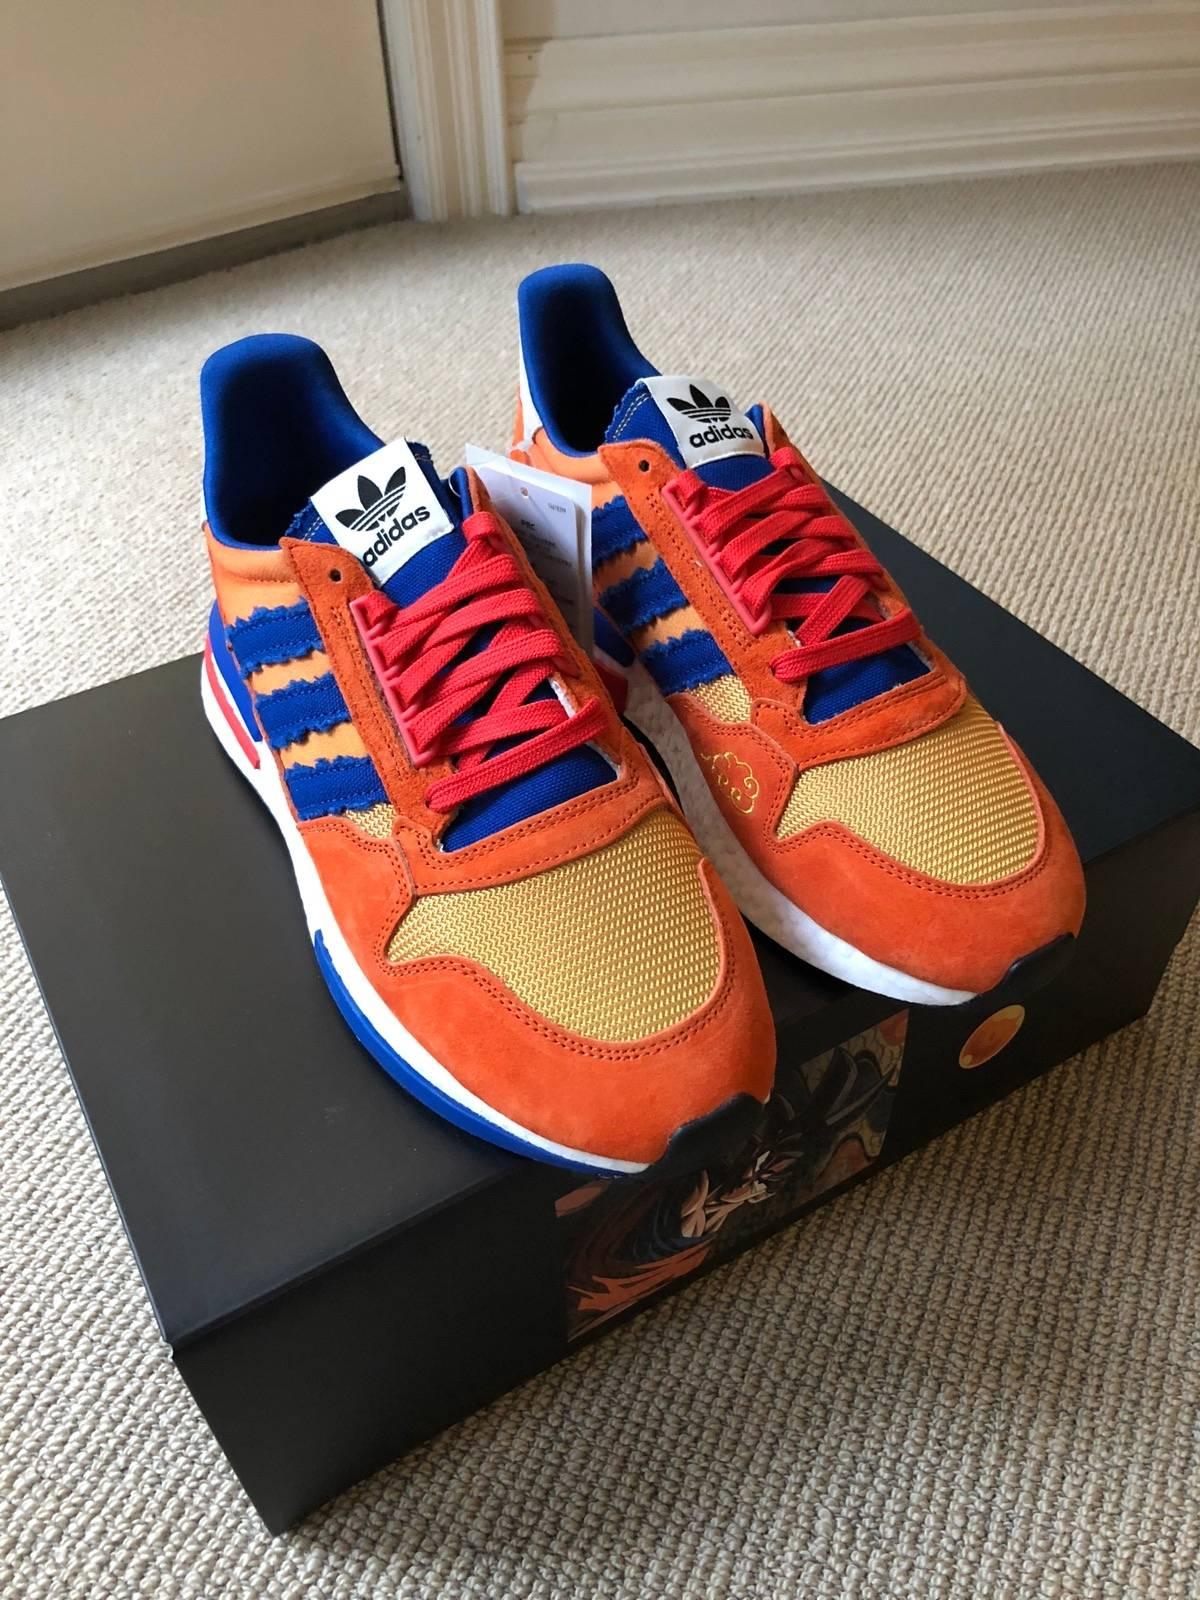 buy popular 24e07 bdd5d Adidas Adidas Zx 500 Rm Dragon Ball Z Son Goku Size 11 $285